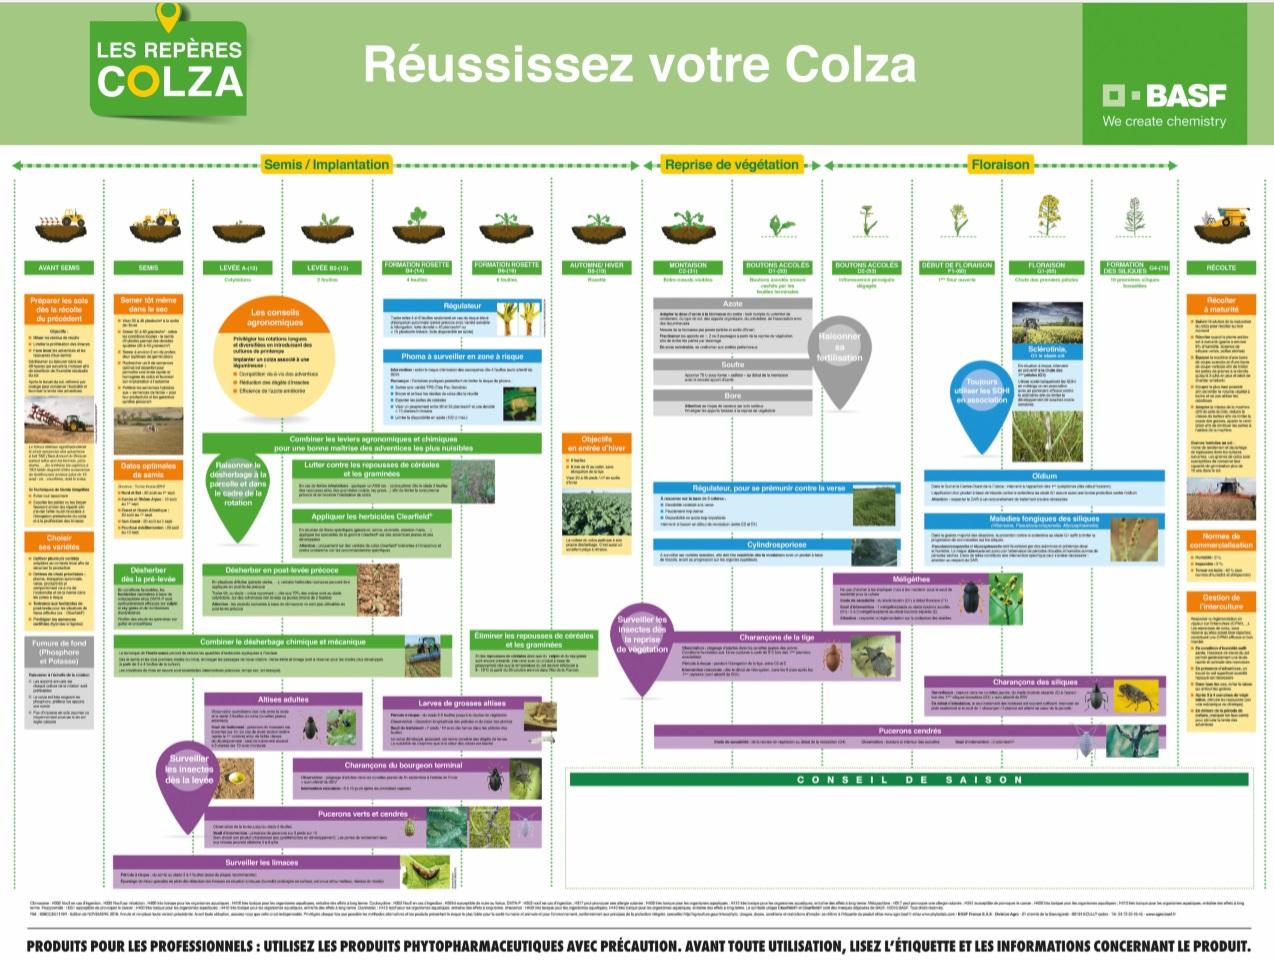 COLZA.jpg